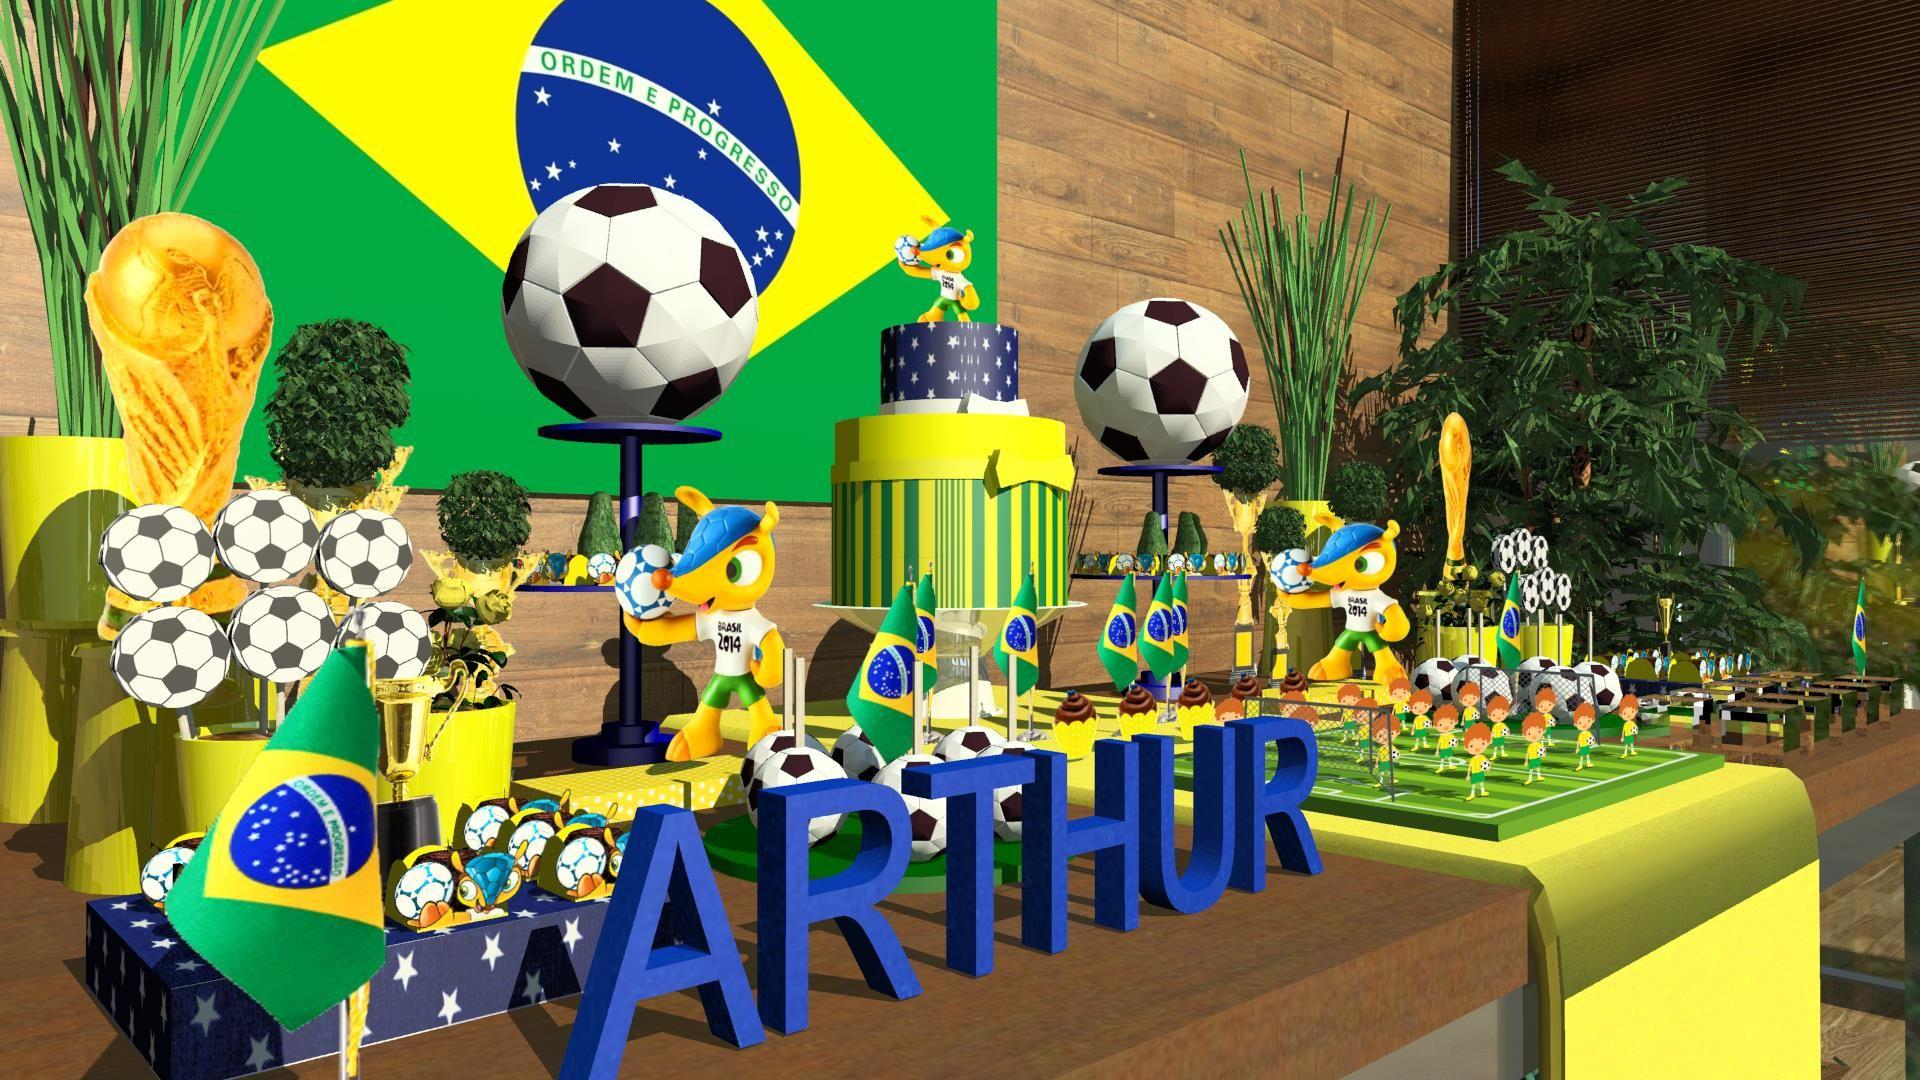 Imagen Relacionada Decoracao Festa Infantil Decoracao Copa Do